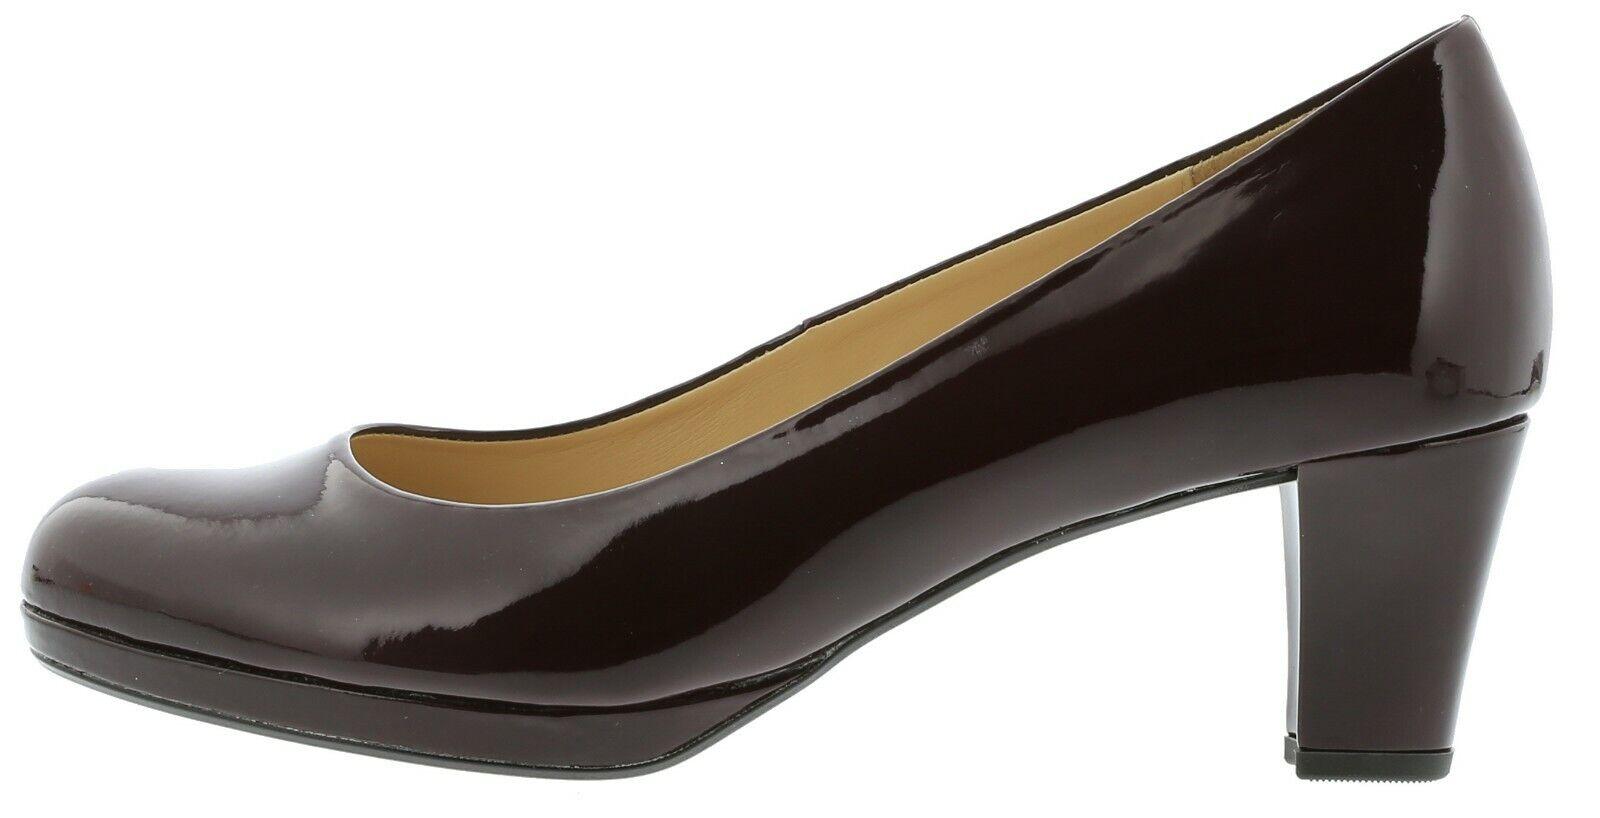 Femmes formelle à talon escarpins GABOR Figaro Merlot Taille UK 4, 4.5, 5.5, 6.5, 7